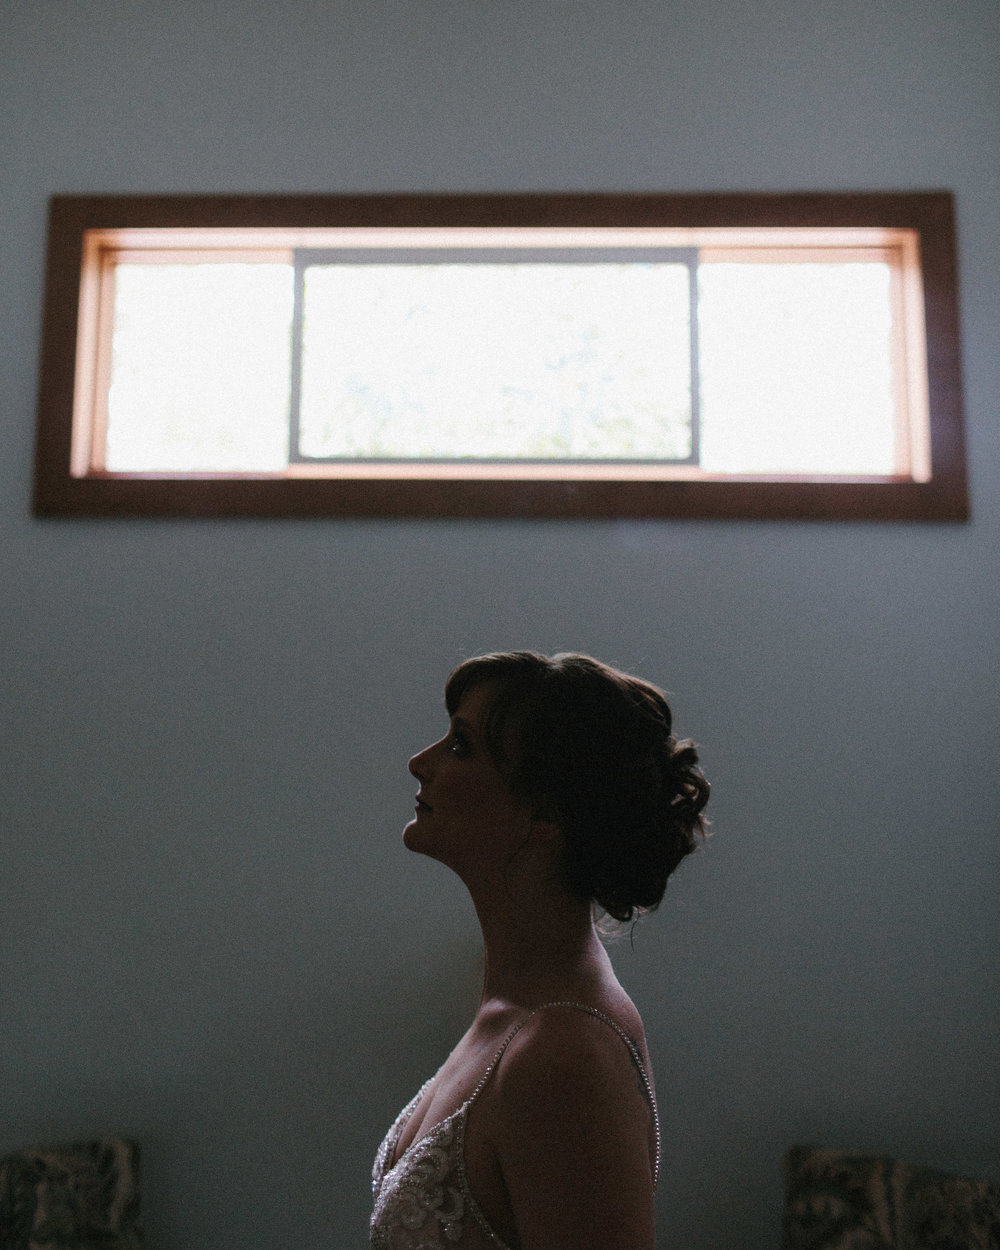 dahlonega_juliette_chapel_photojournalism_atlanta_wedding_photographers_1198.jpg